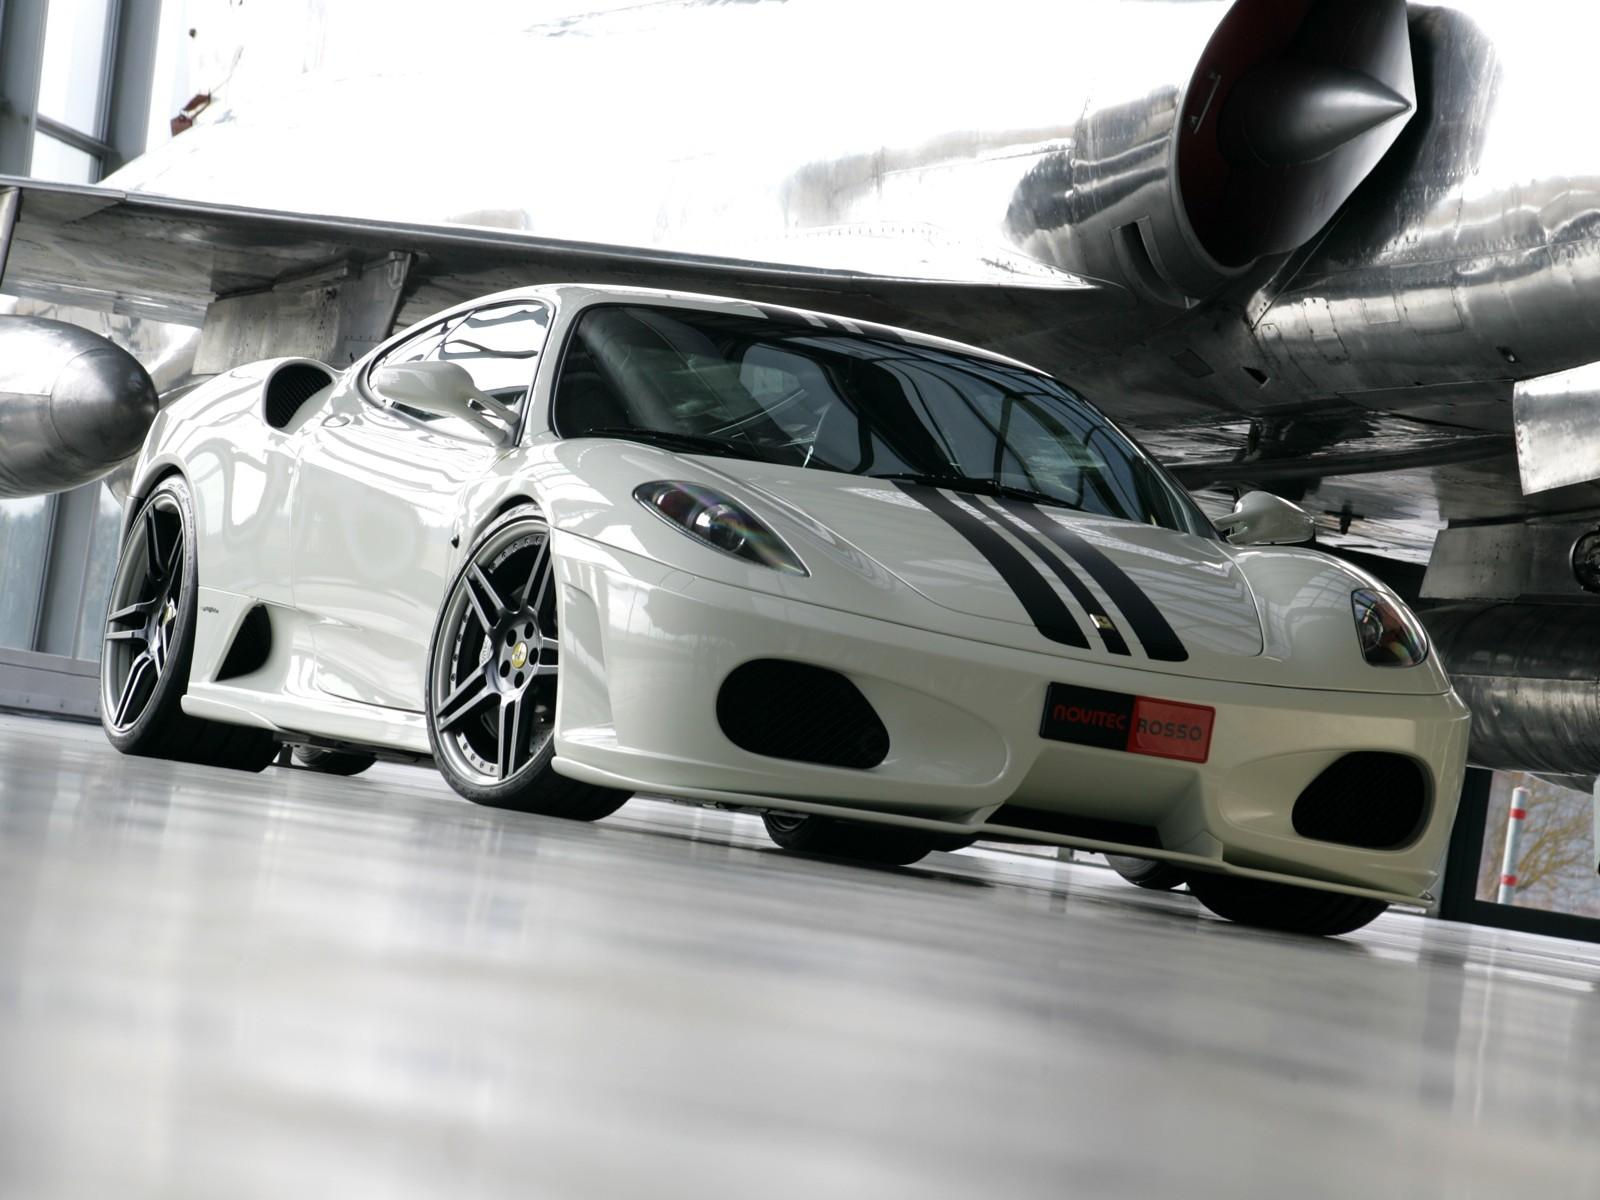 http://1.bp.blogspot.com/-_E6TYXRm8WE/TsuY7q6EFLI/AAAAAAAAM14/PFYi8Tw-aho/s1600/Ferrari_f430%25288%2529.jpg